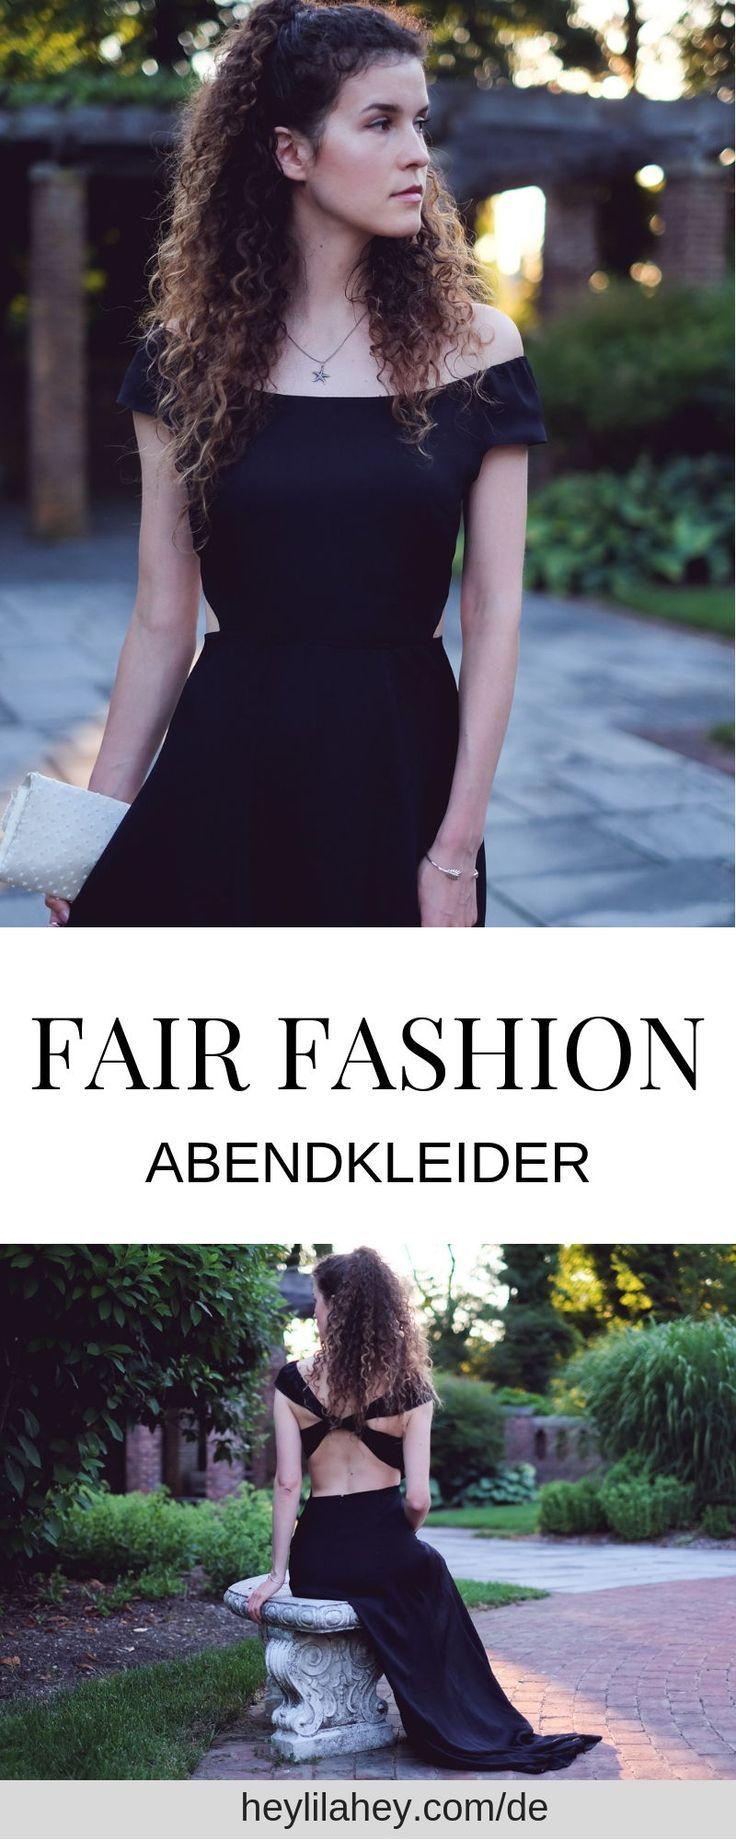 My Ethical Black Tie Dress  Nachhaltige mode, Vegane mode, Abendkleid